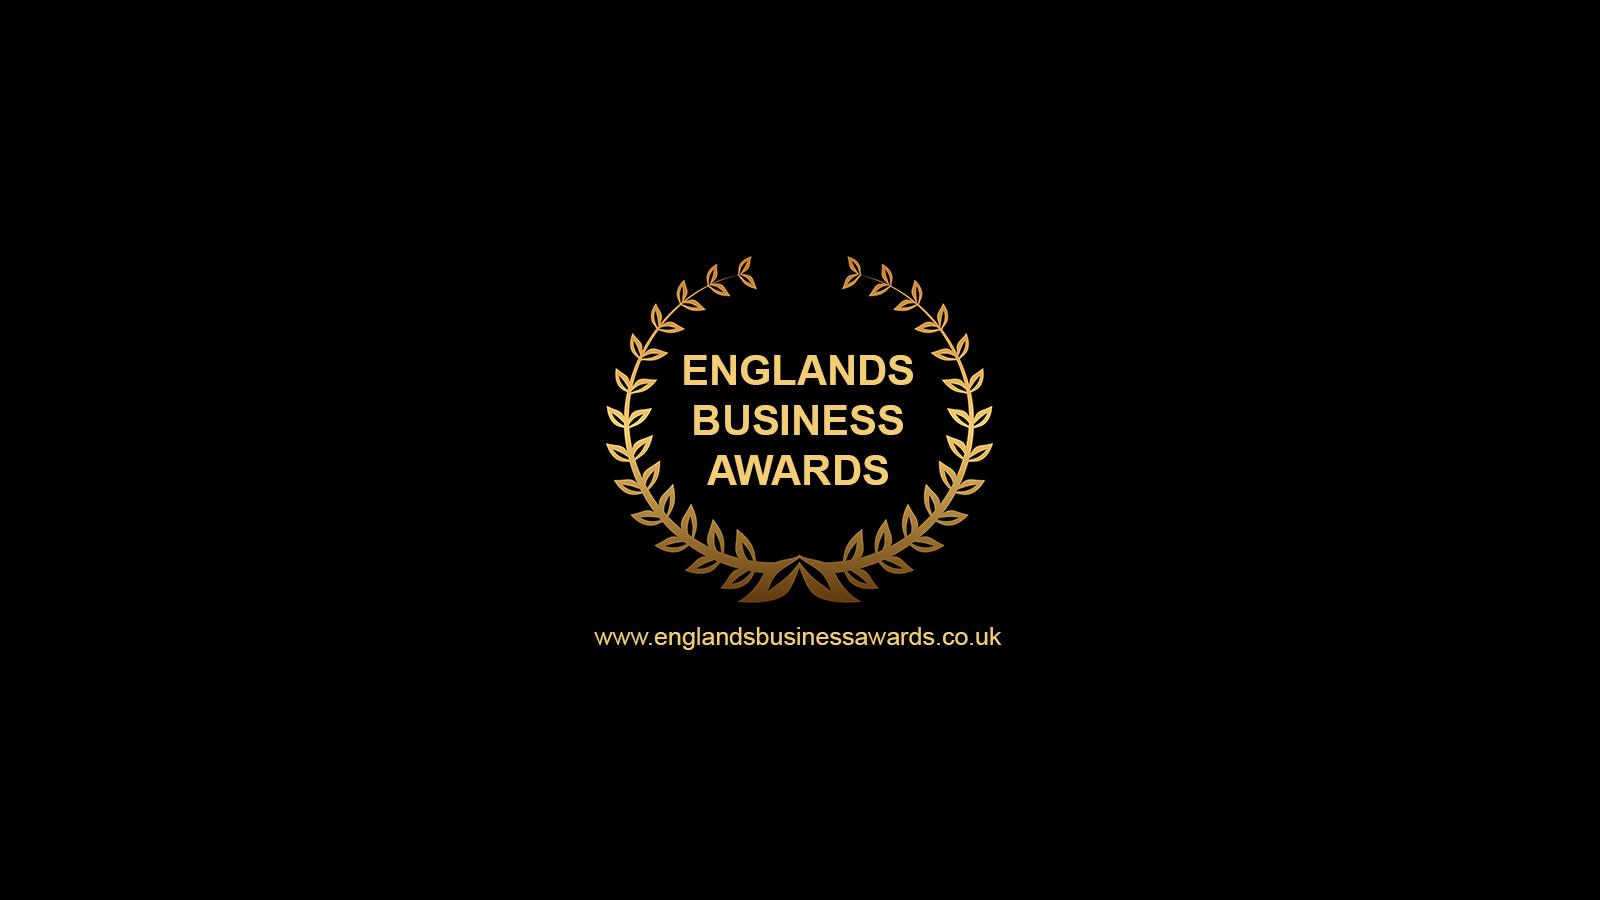 englands business awards